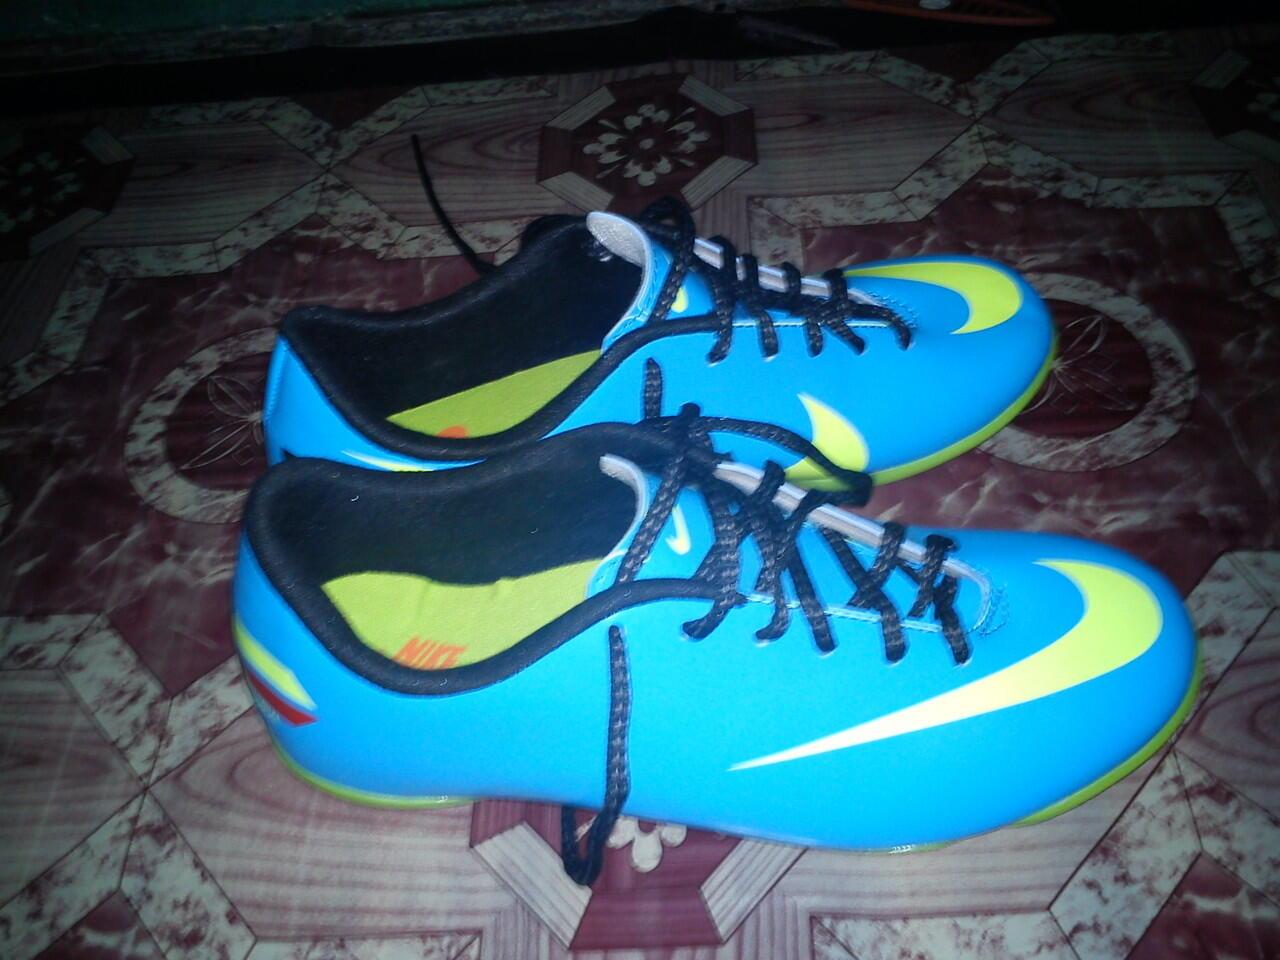 WTS Sepatu Futsal Nike Mercurial Vapor KW Super